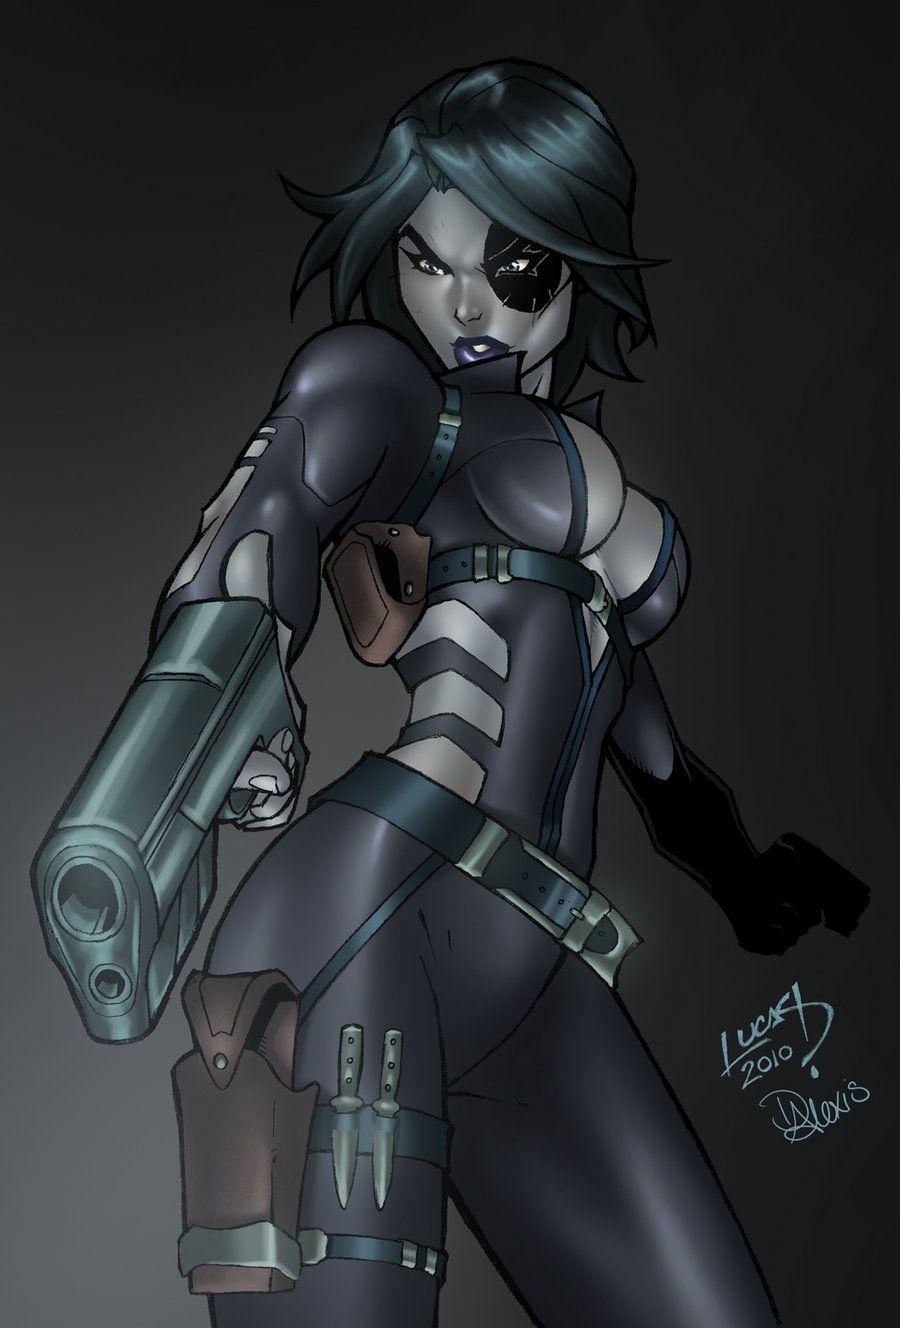 Domino COLORED III by LucasAckerman.deviantart.com on @DeviantArt